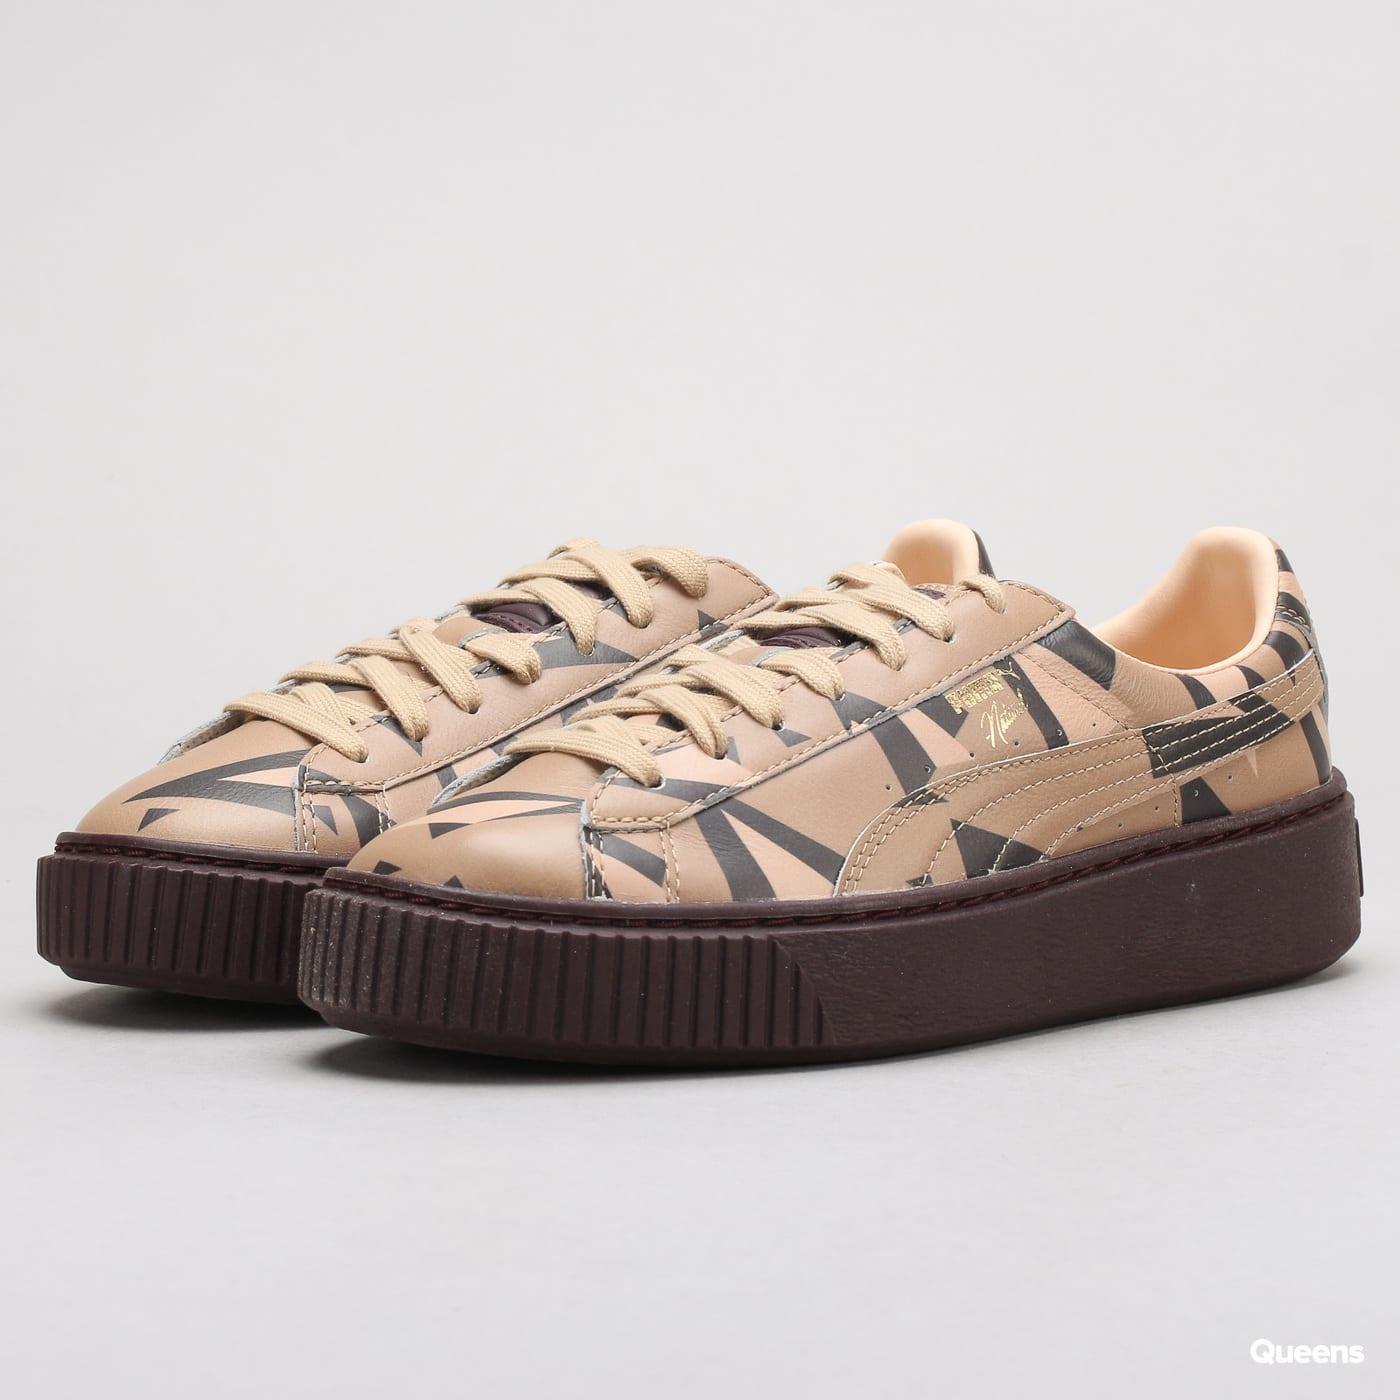 08bb908d617 Puma Platform Cheetah Wn s Naturel (364458 01)– Queens 💚